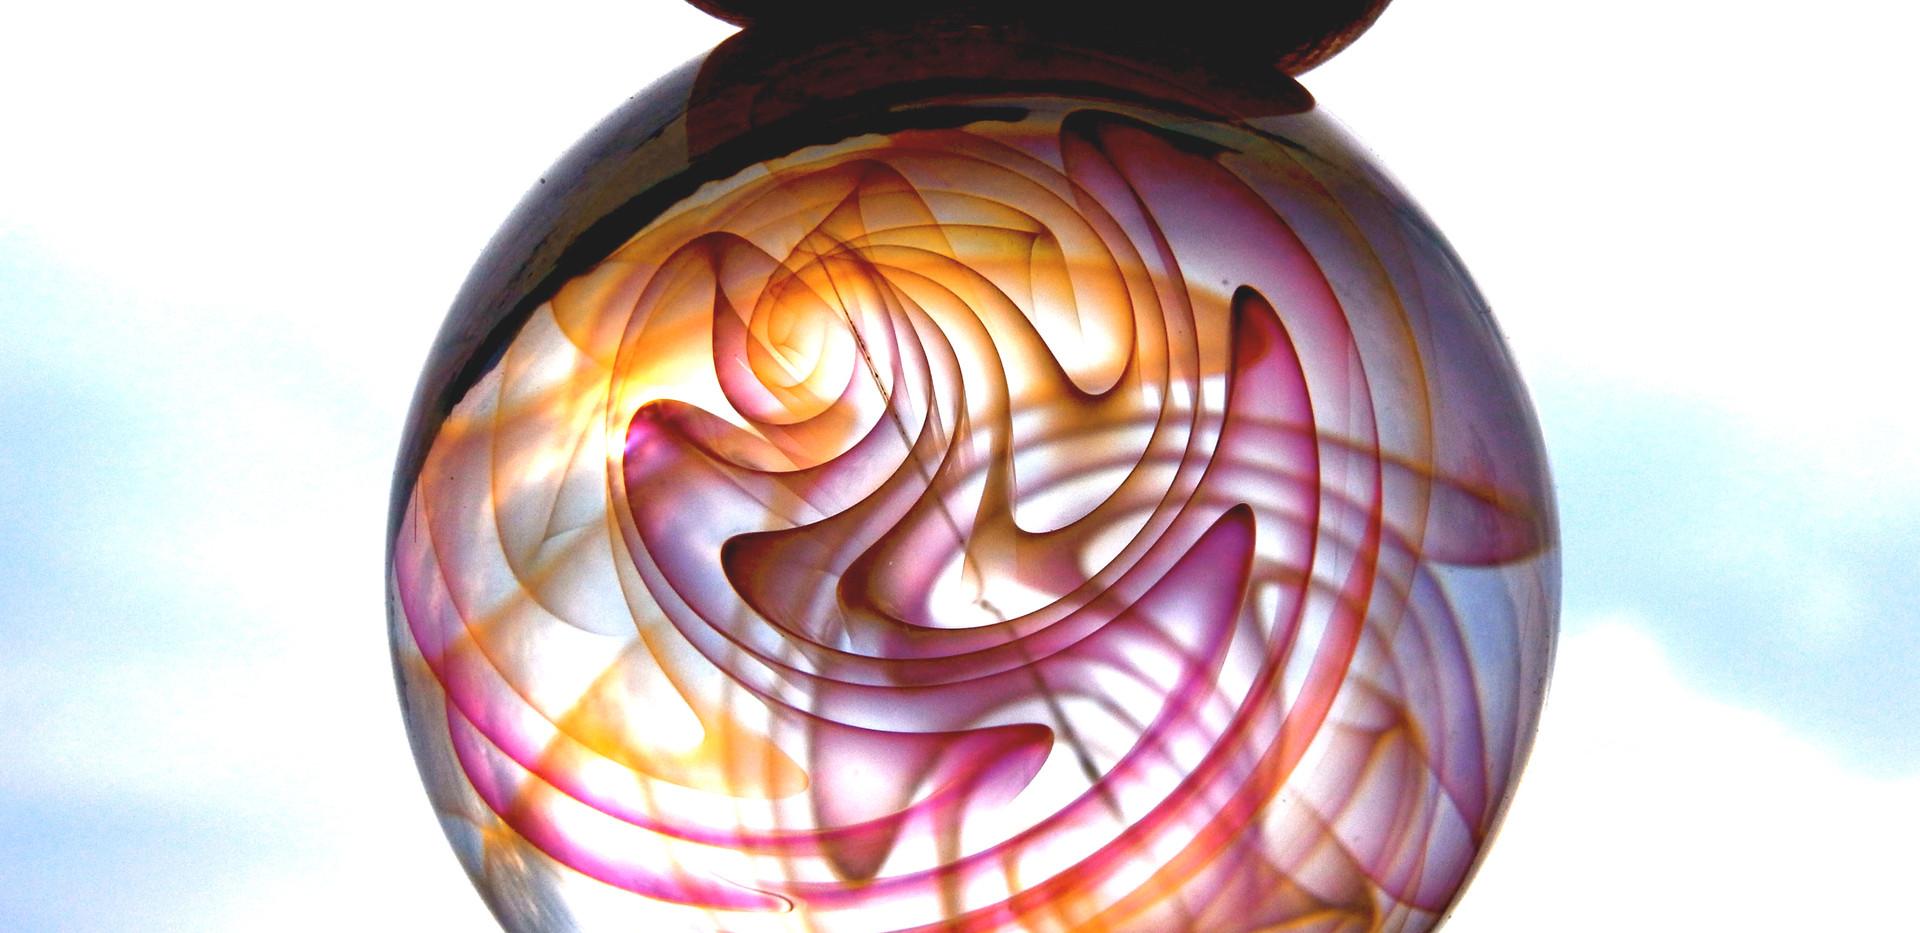 Lampwork glass: borosilicate glass